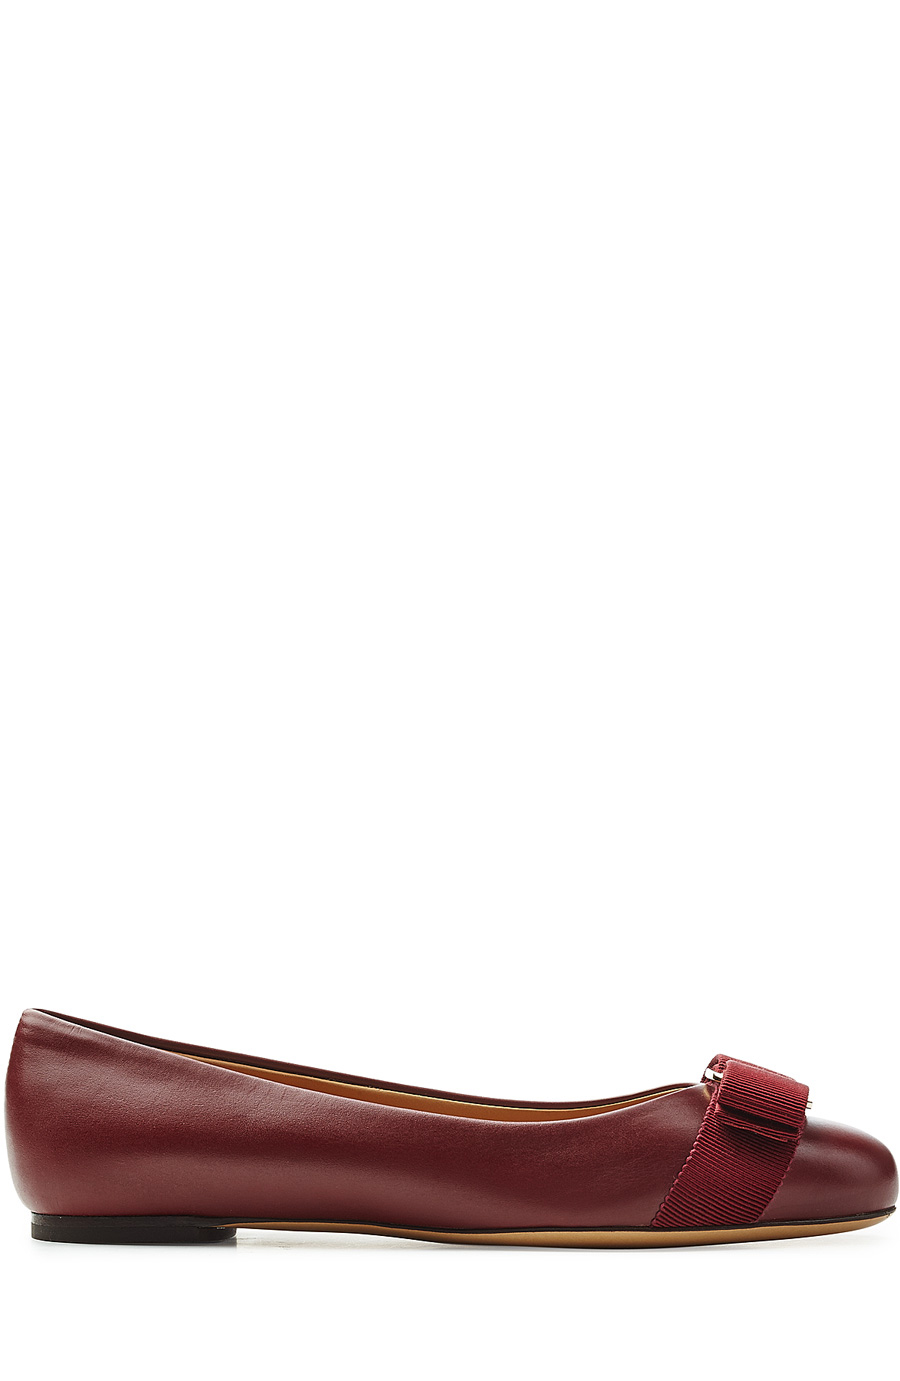 Salvatore Ferragamo Black Leather 'mimi' Bow Detail Ballerina Flats